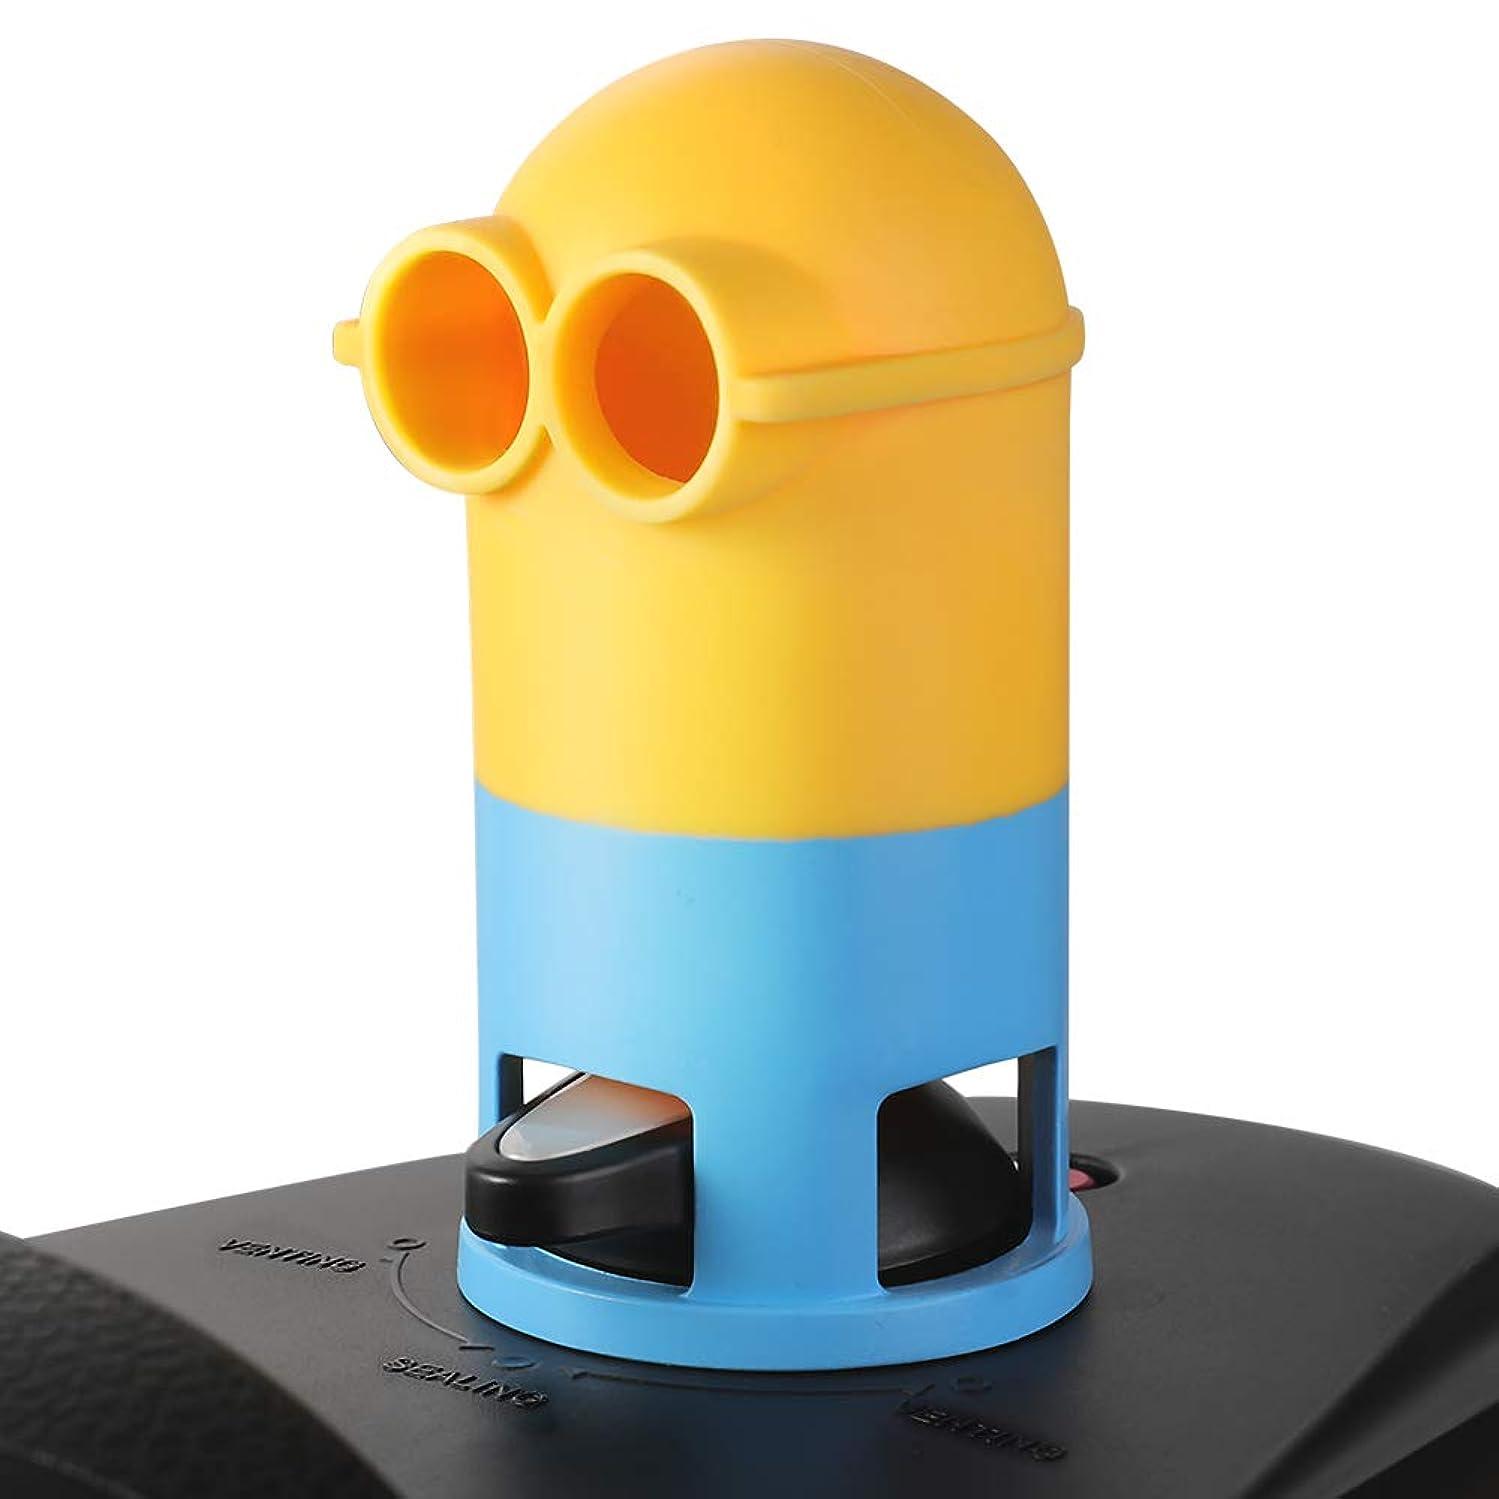 Goldlion Steam Diverter Pressure Release Valve Accessories Compatible with Instant Pot LUX, Ninja Foodi, Crock-Pot Express and Power Pressure Cooker